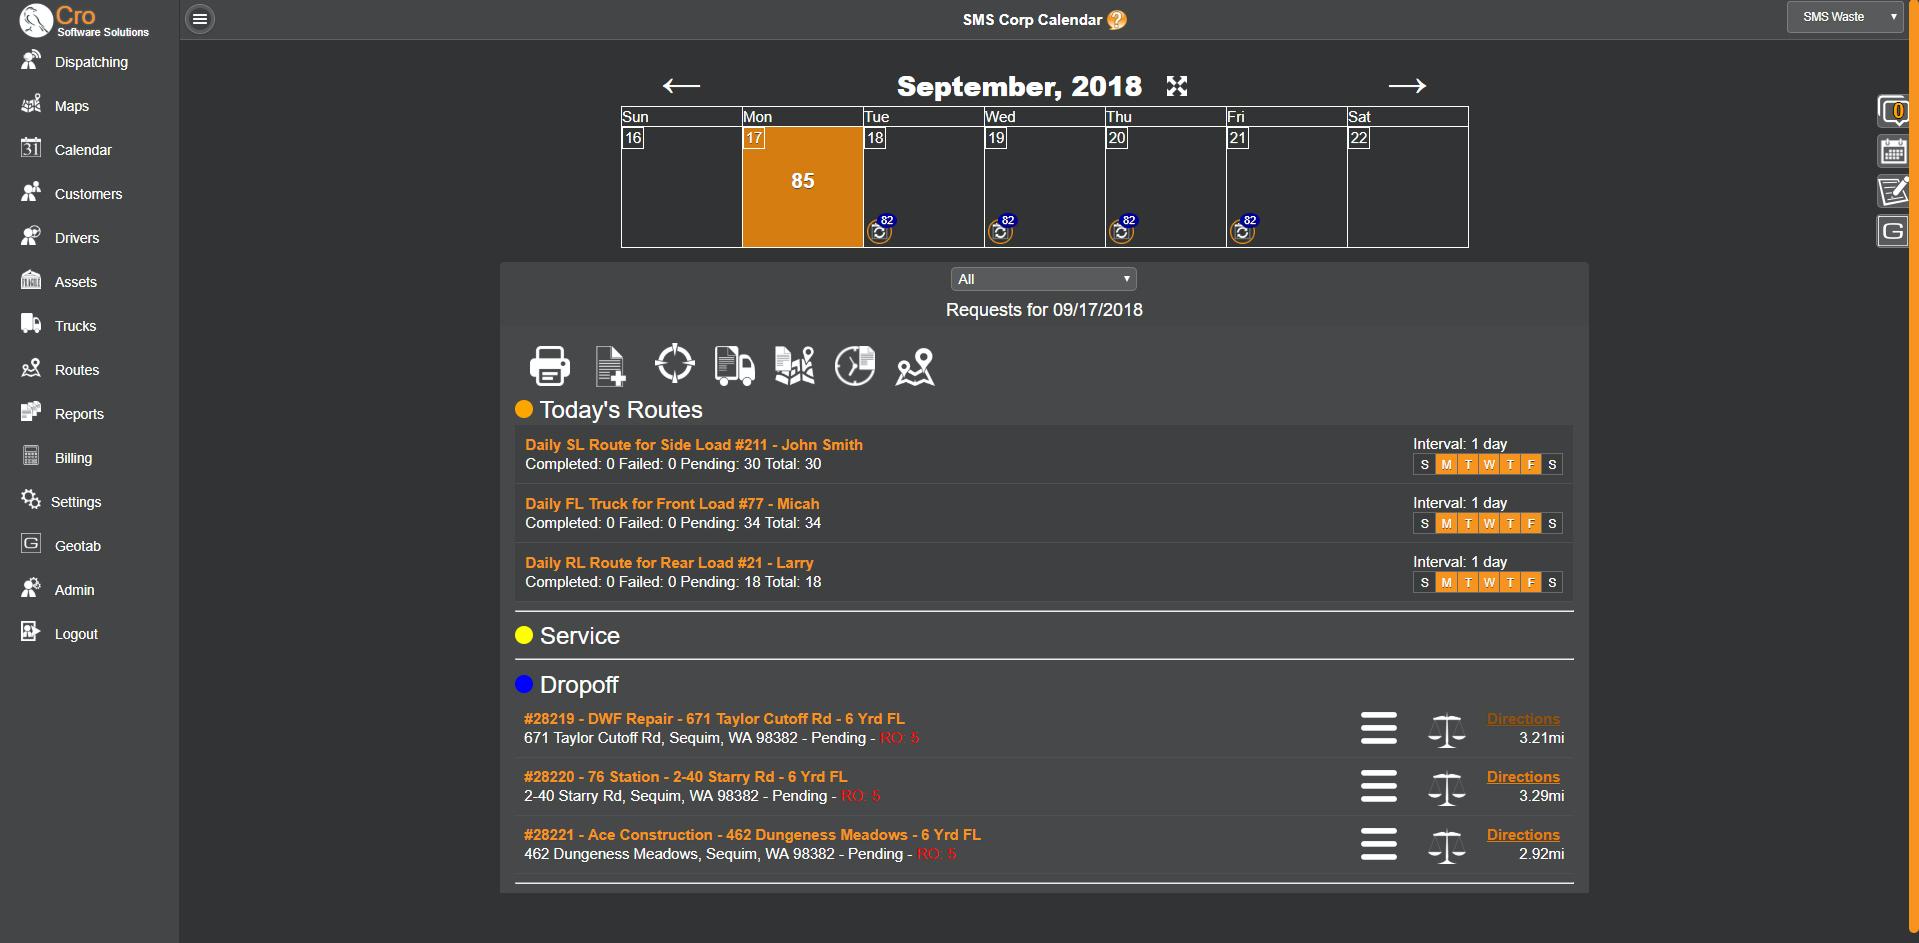 CRO Software scheduling screenshot